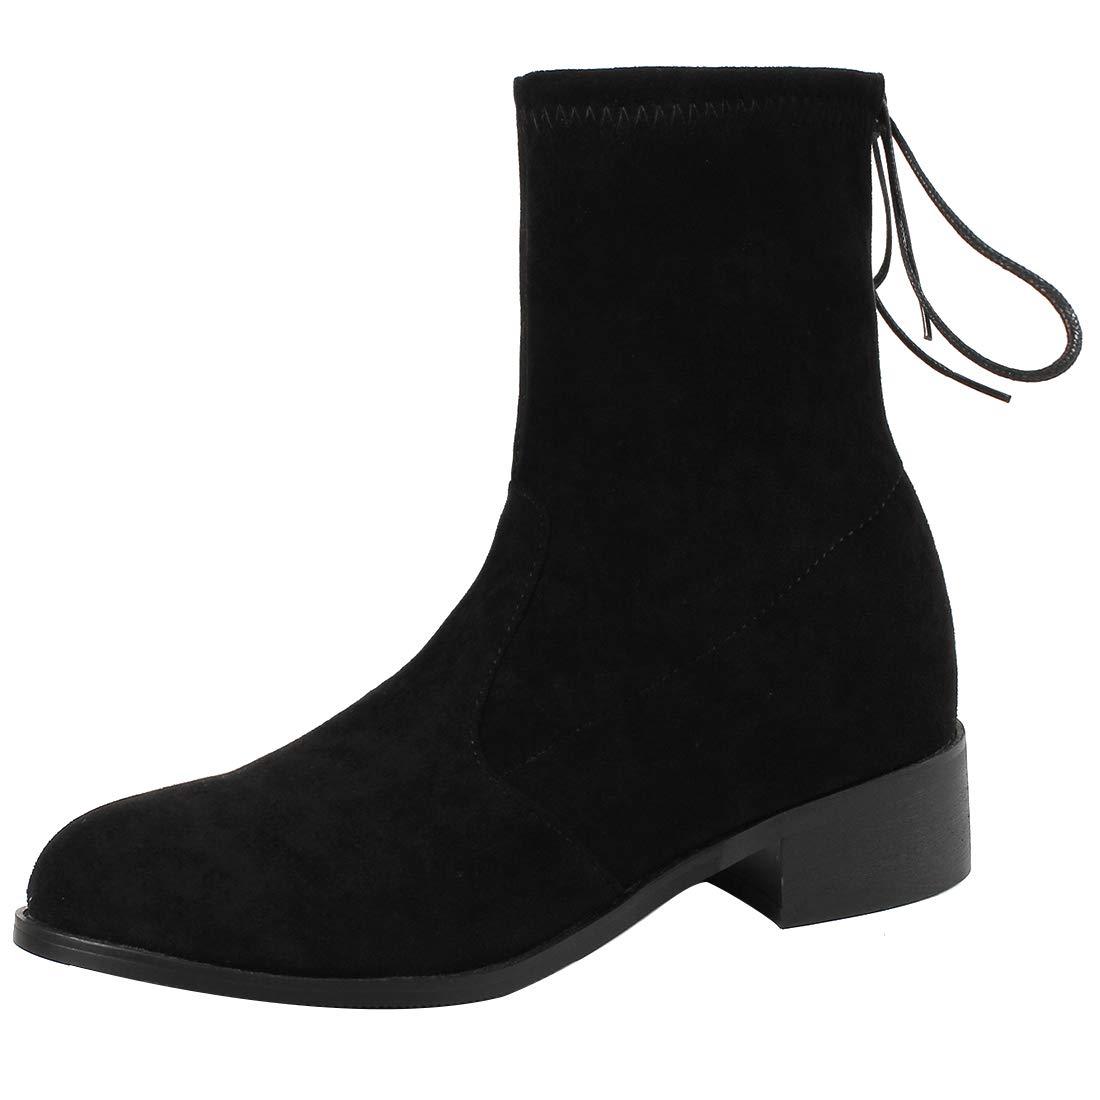 Jushee Juinstr Womens Juinstr Jushee 3.5 cm Low-Heel Ankle Pull-on Suede Boots B07H7ZFP86 Boots d5e3bf